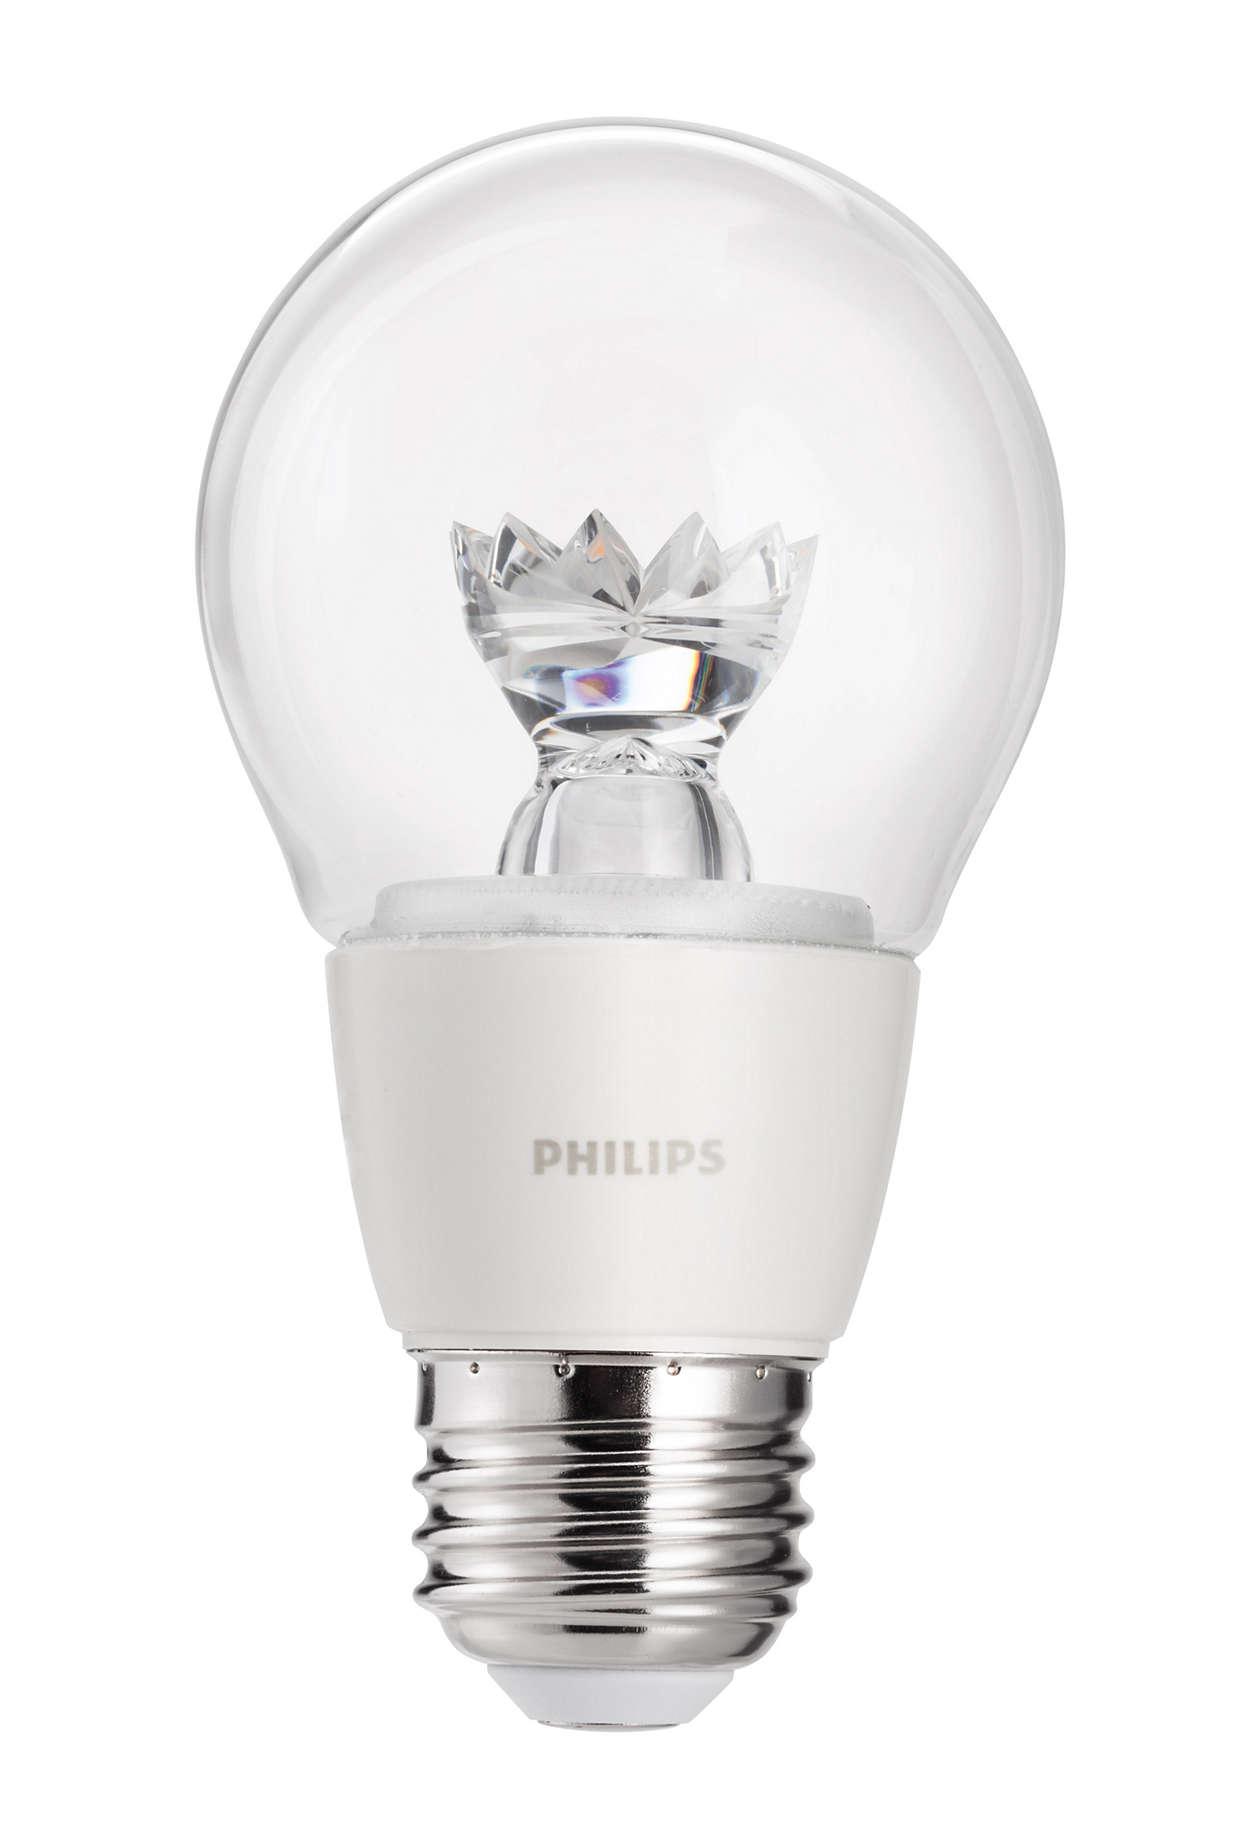 All-purpose light with a brilliant sparkle